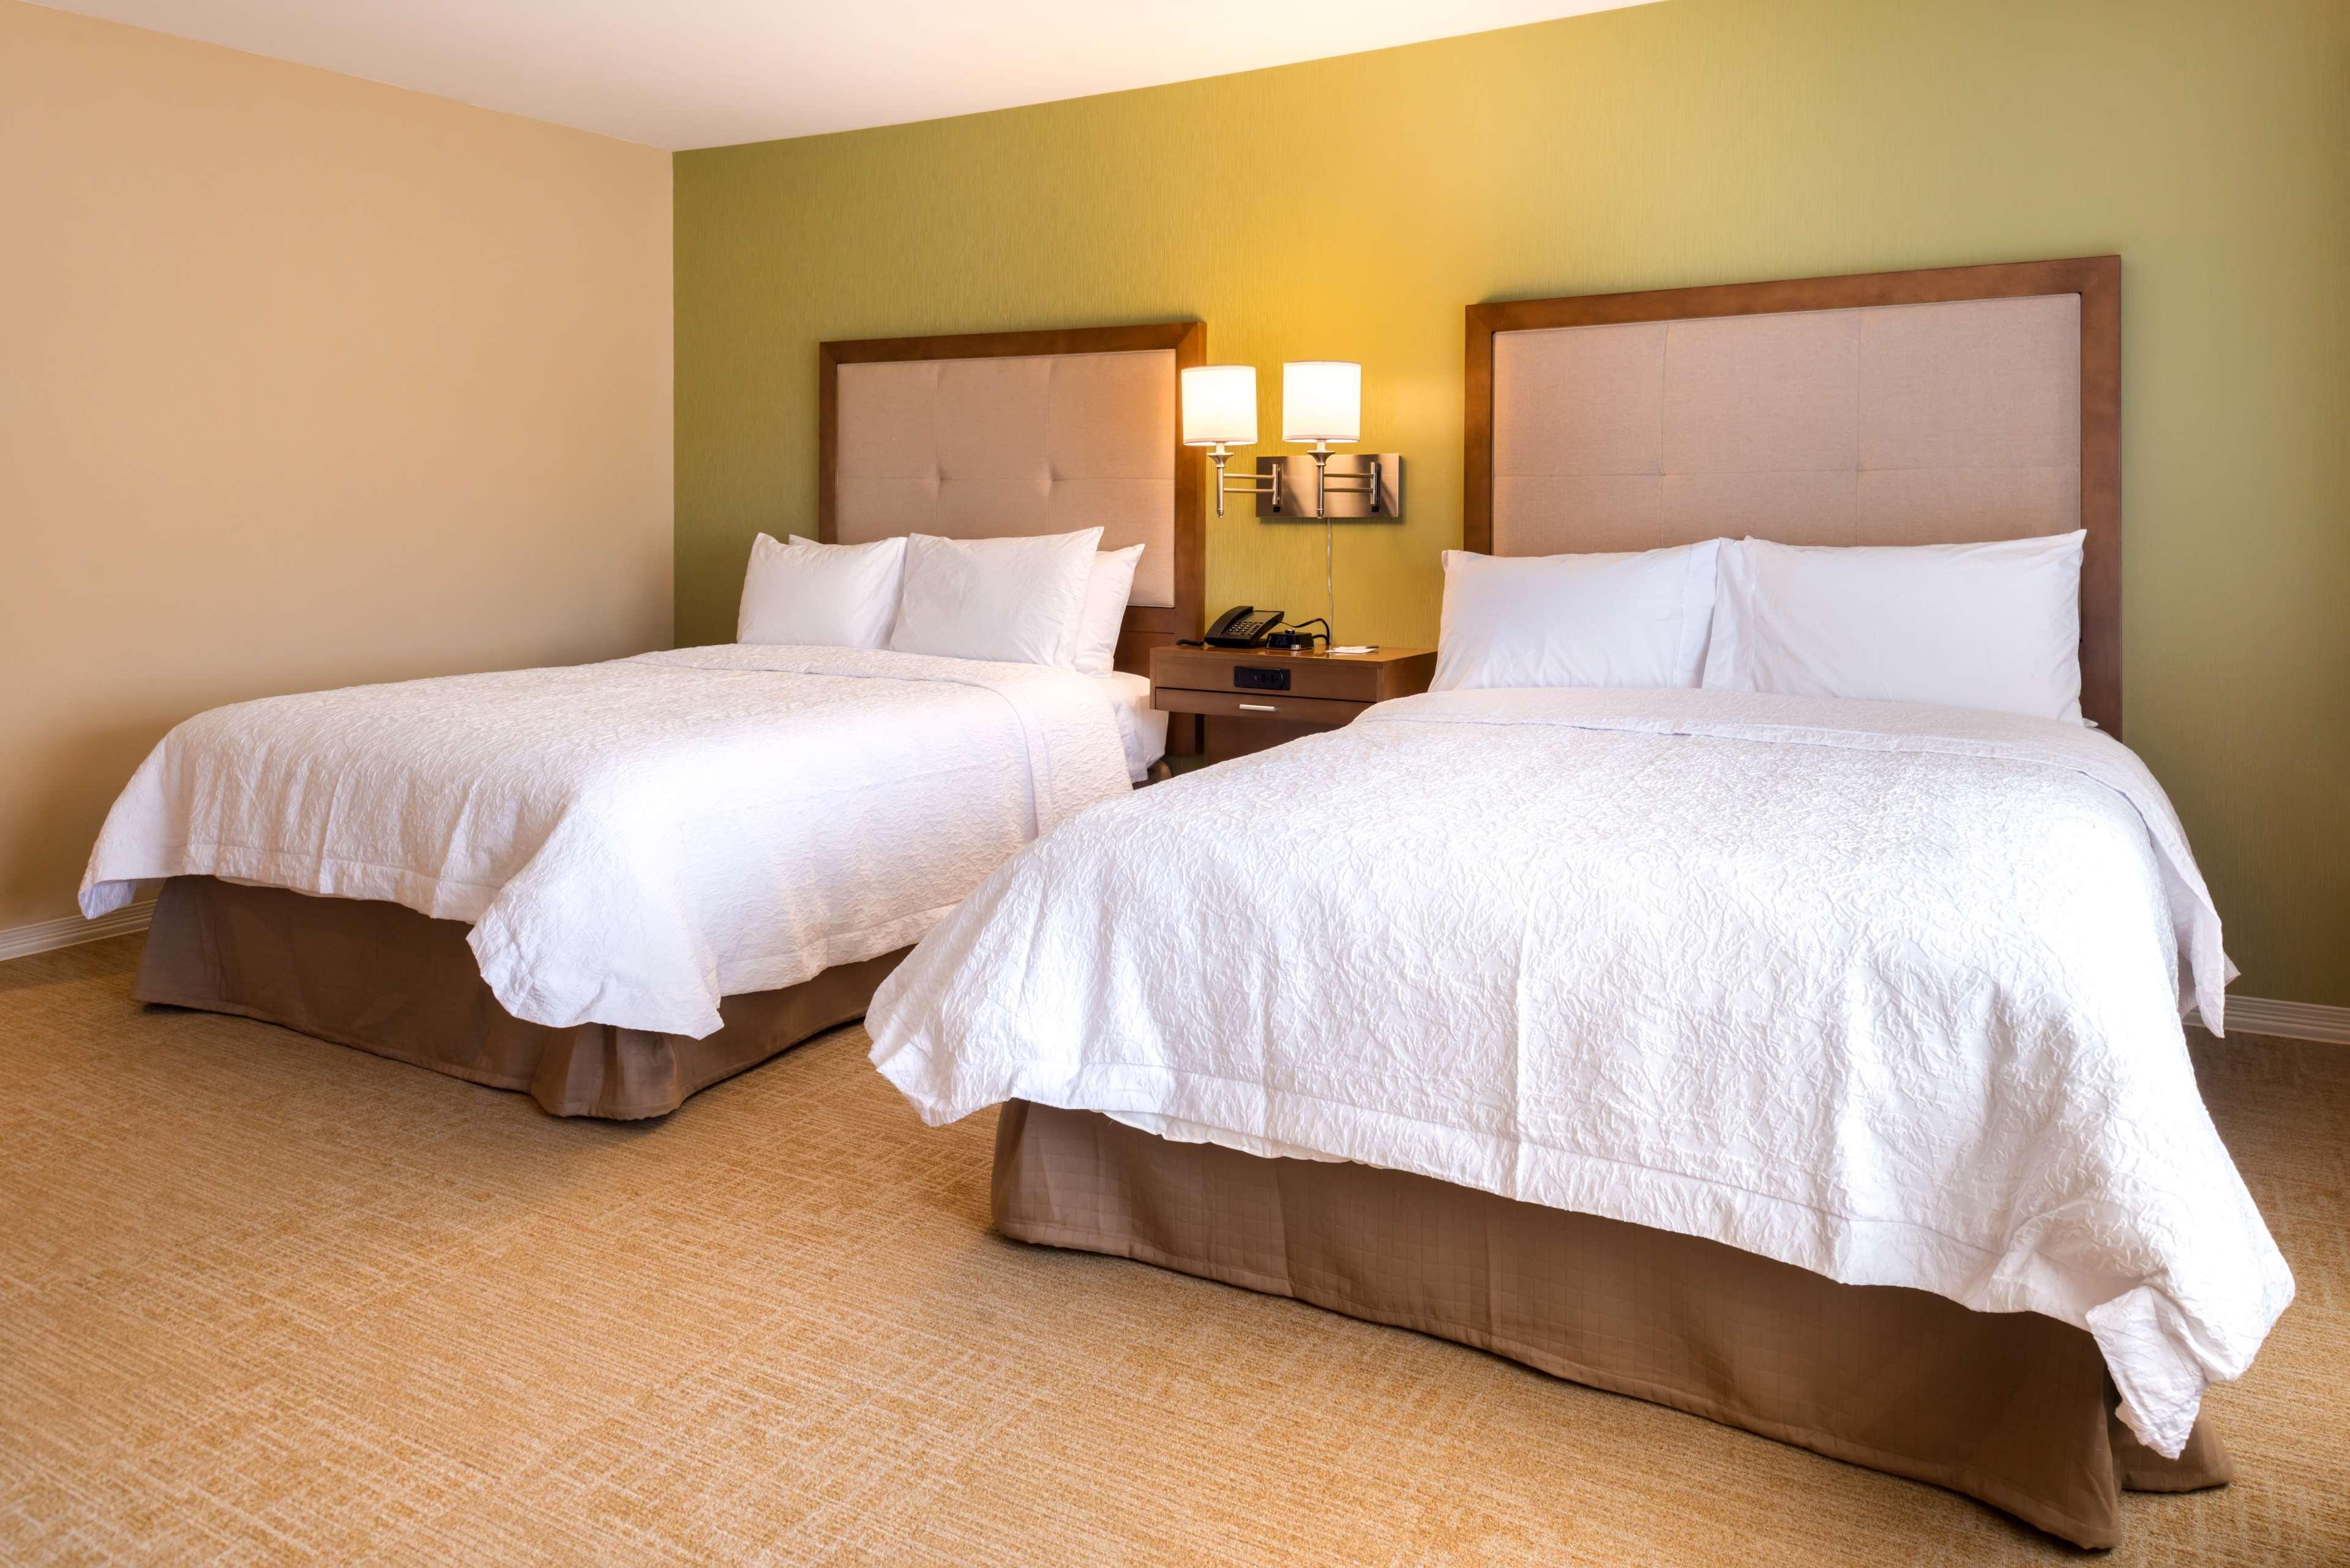 Hampton Inn & Suites Silverthorne image 14